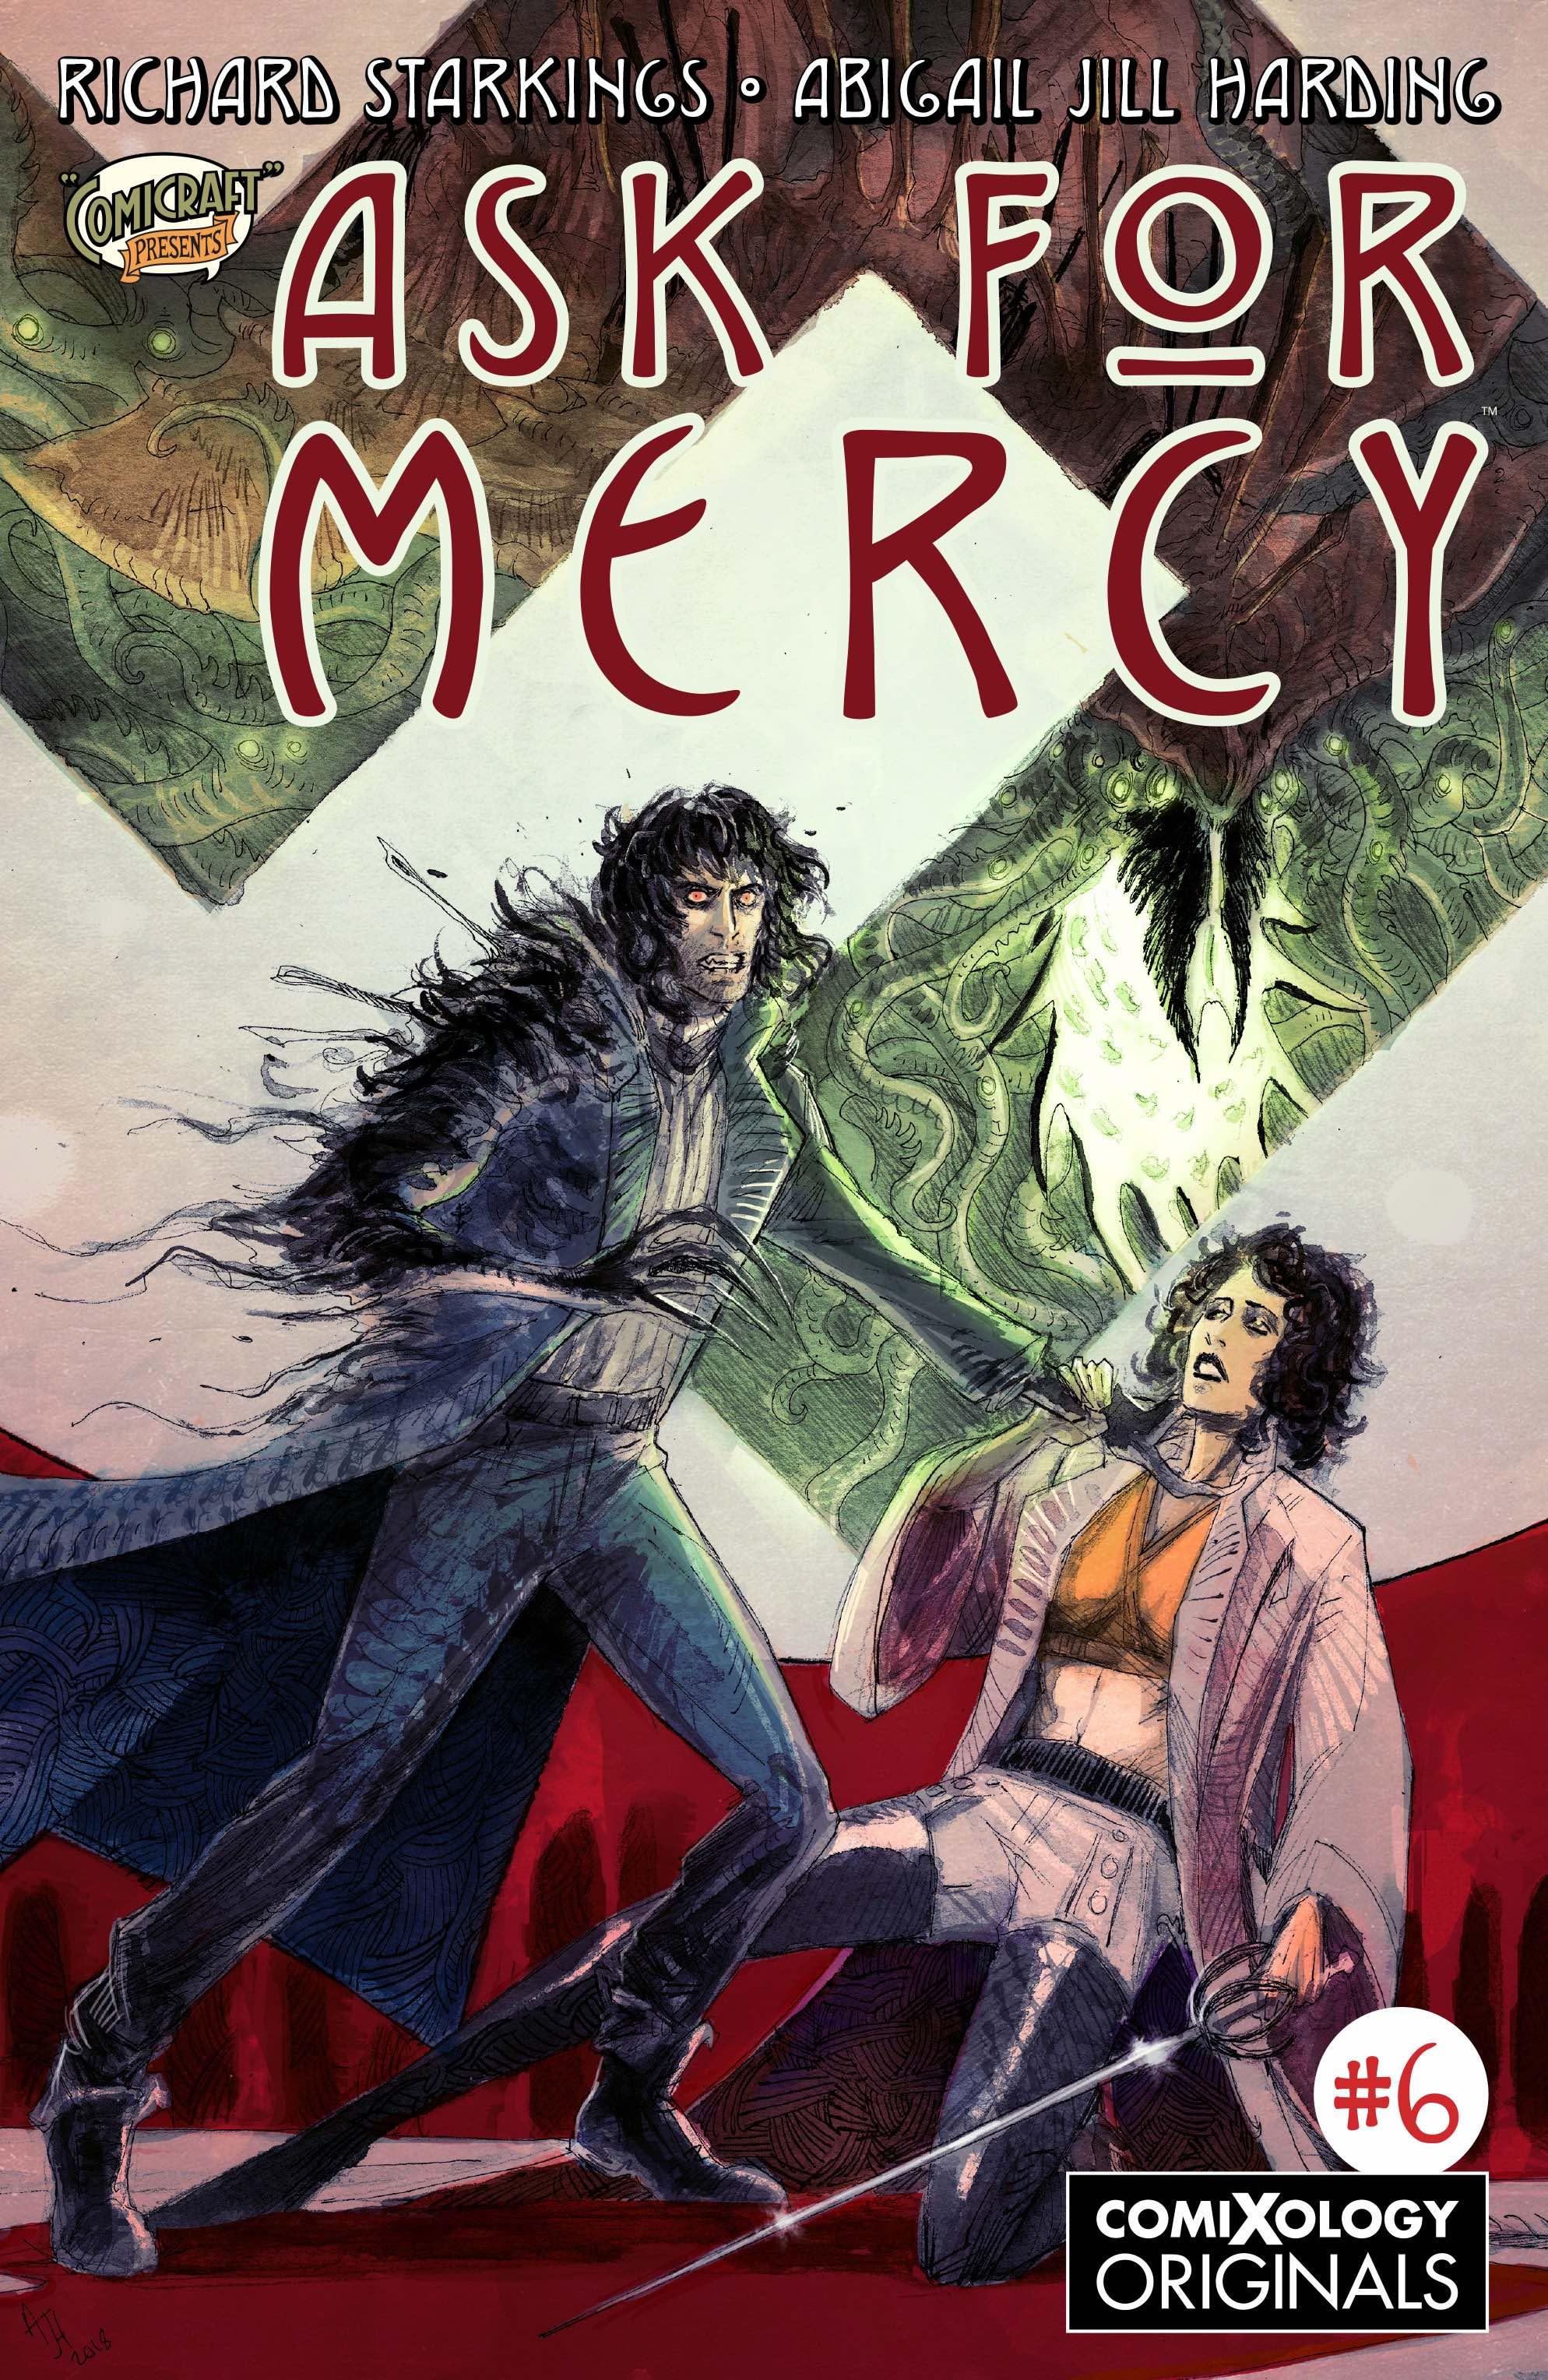 Ask Mercy #6, comiXology Originals